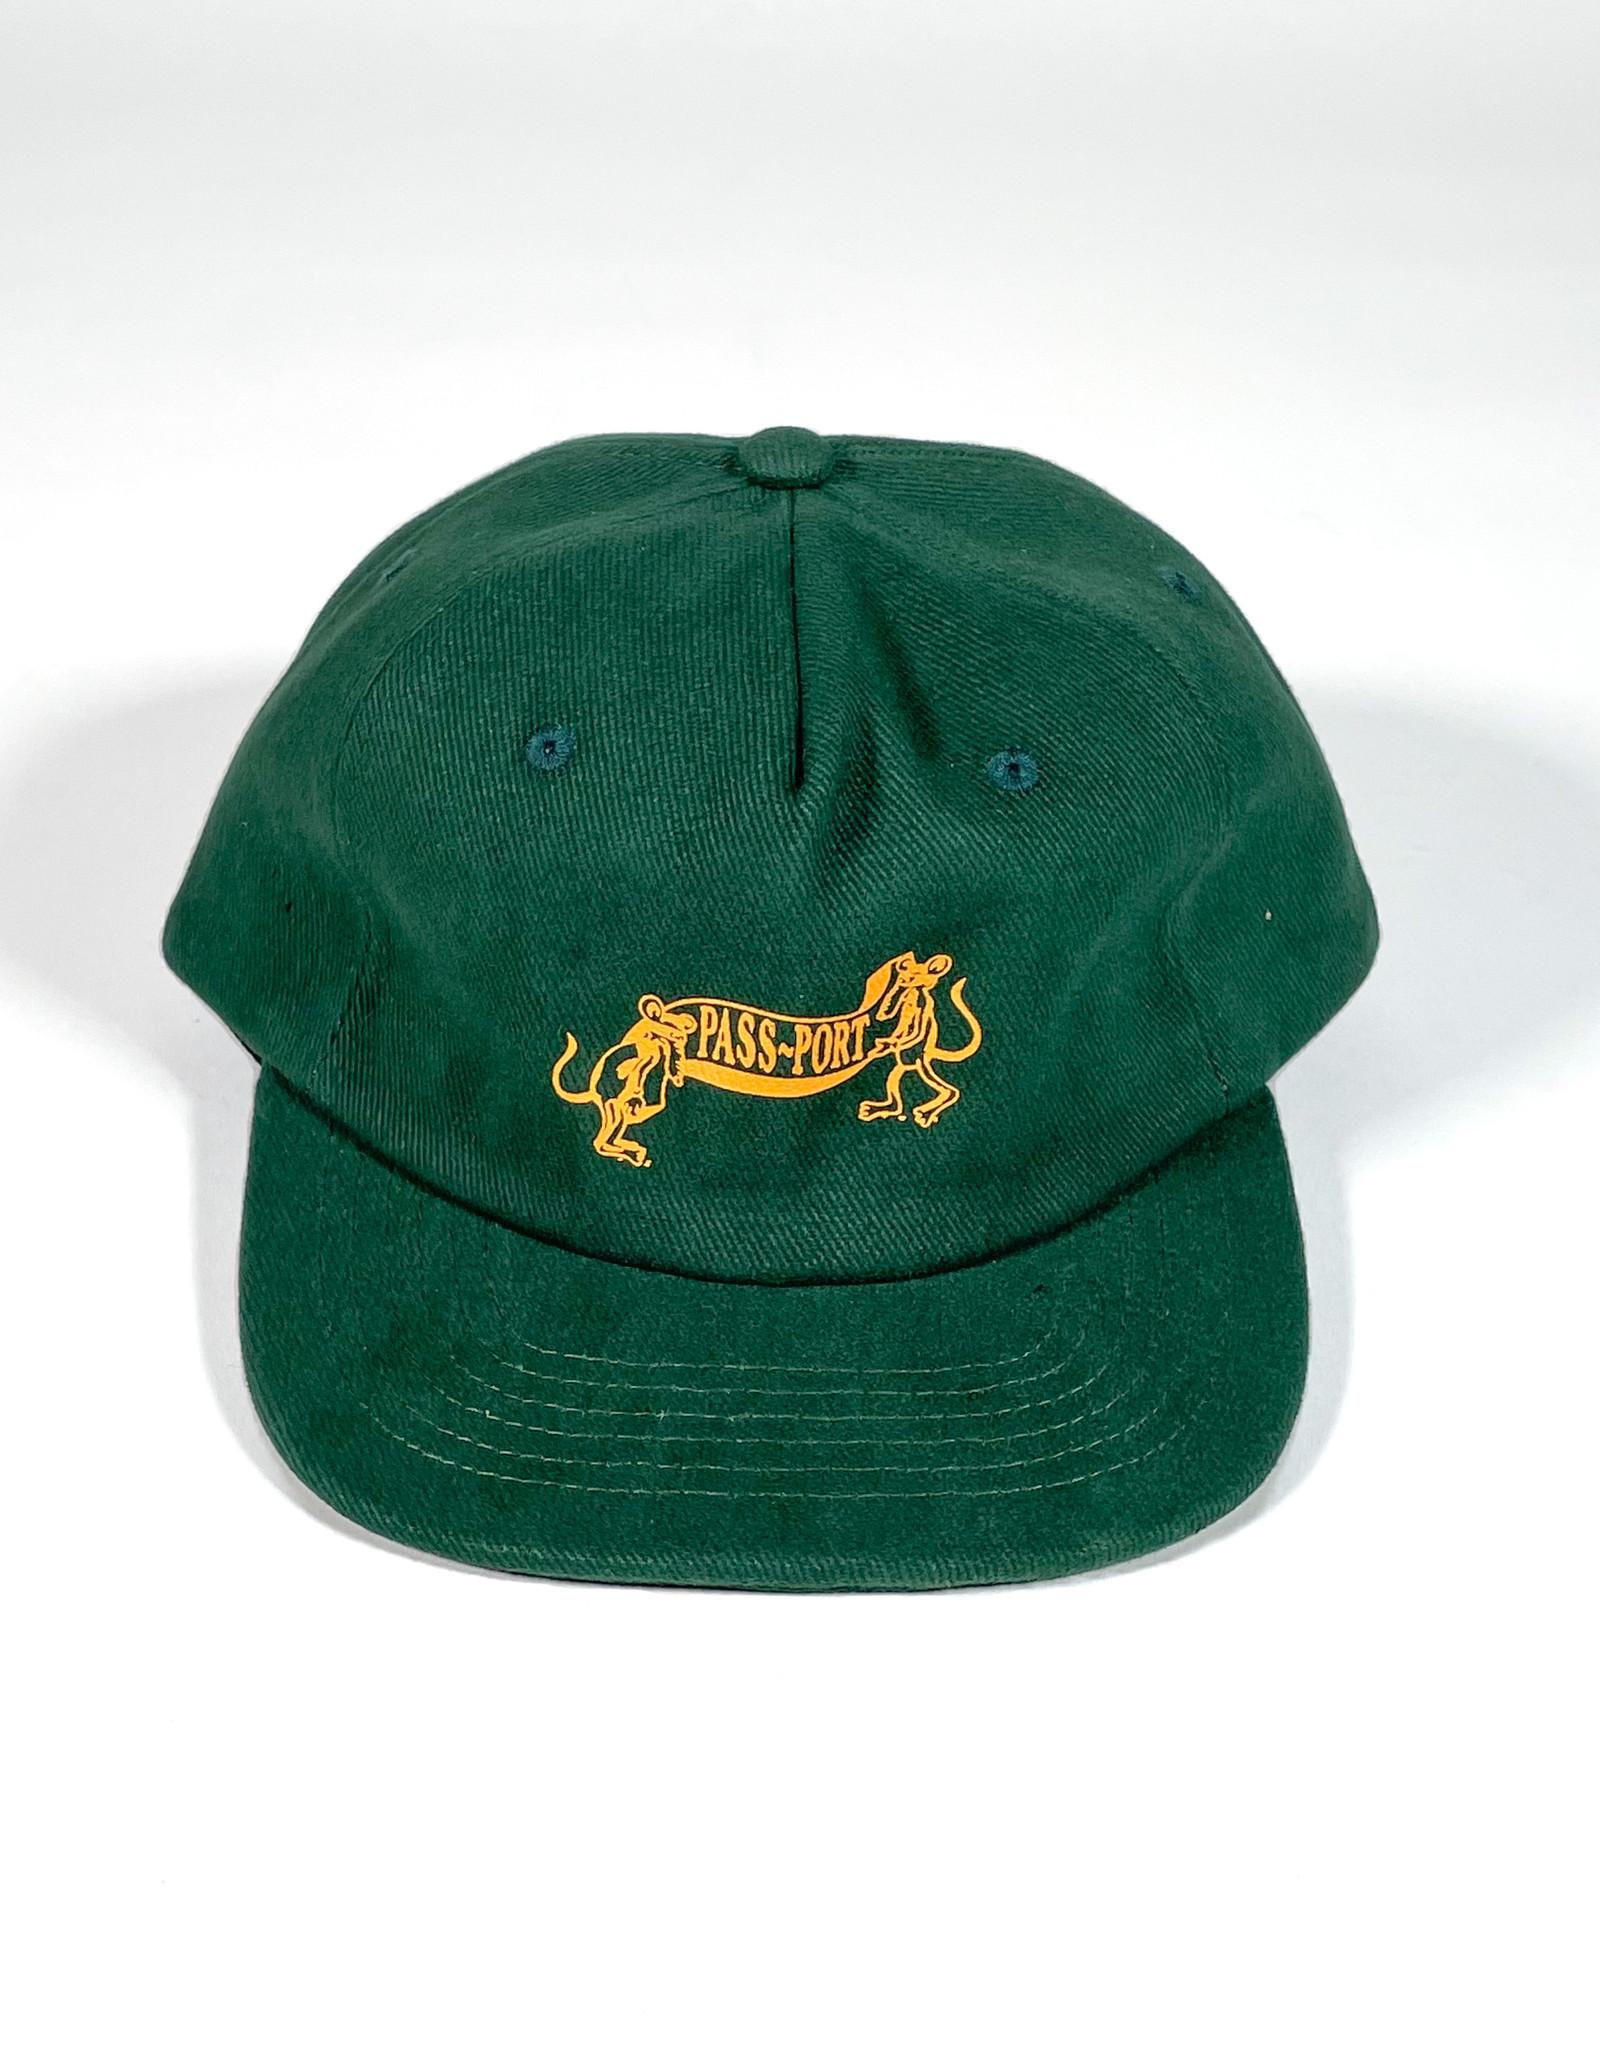 PASSPORT PASS-PORT MISSING TILDE 5 PANNEL HAT - GREEN